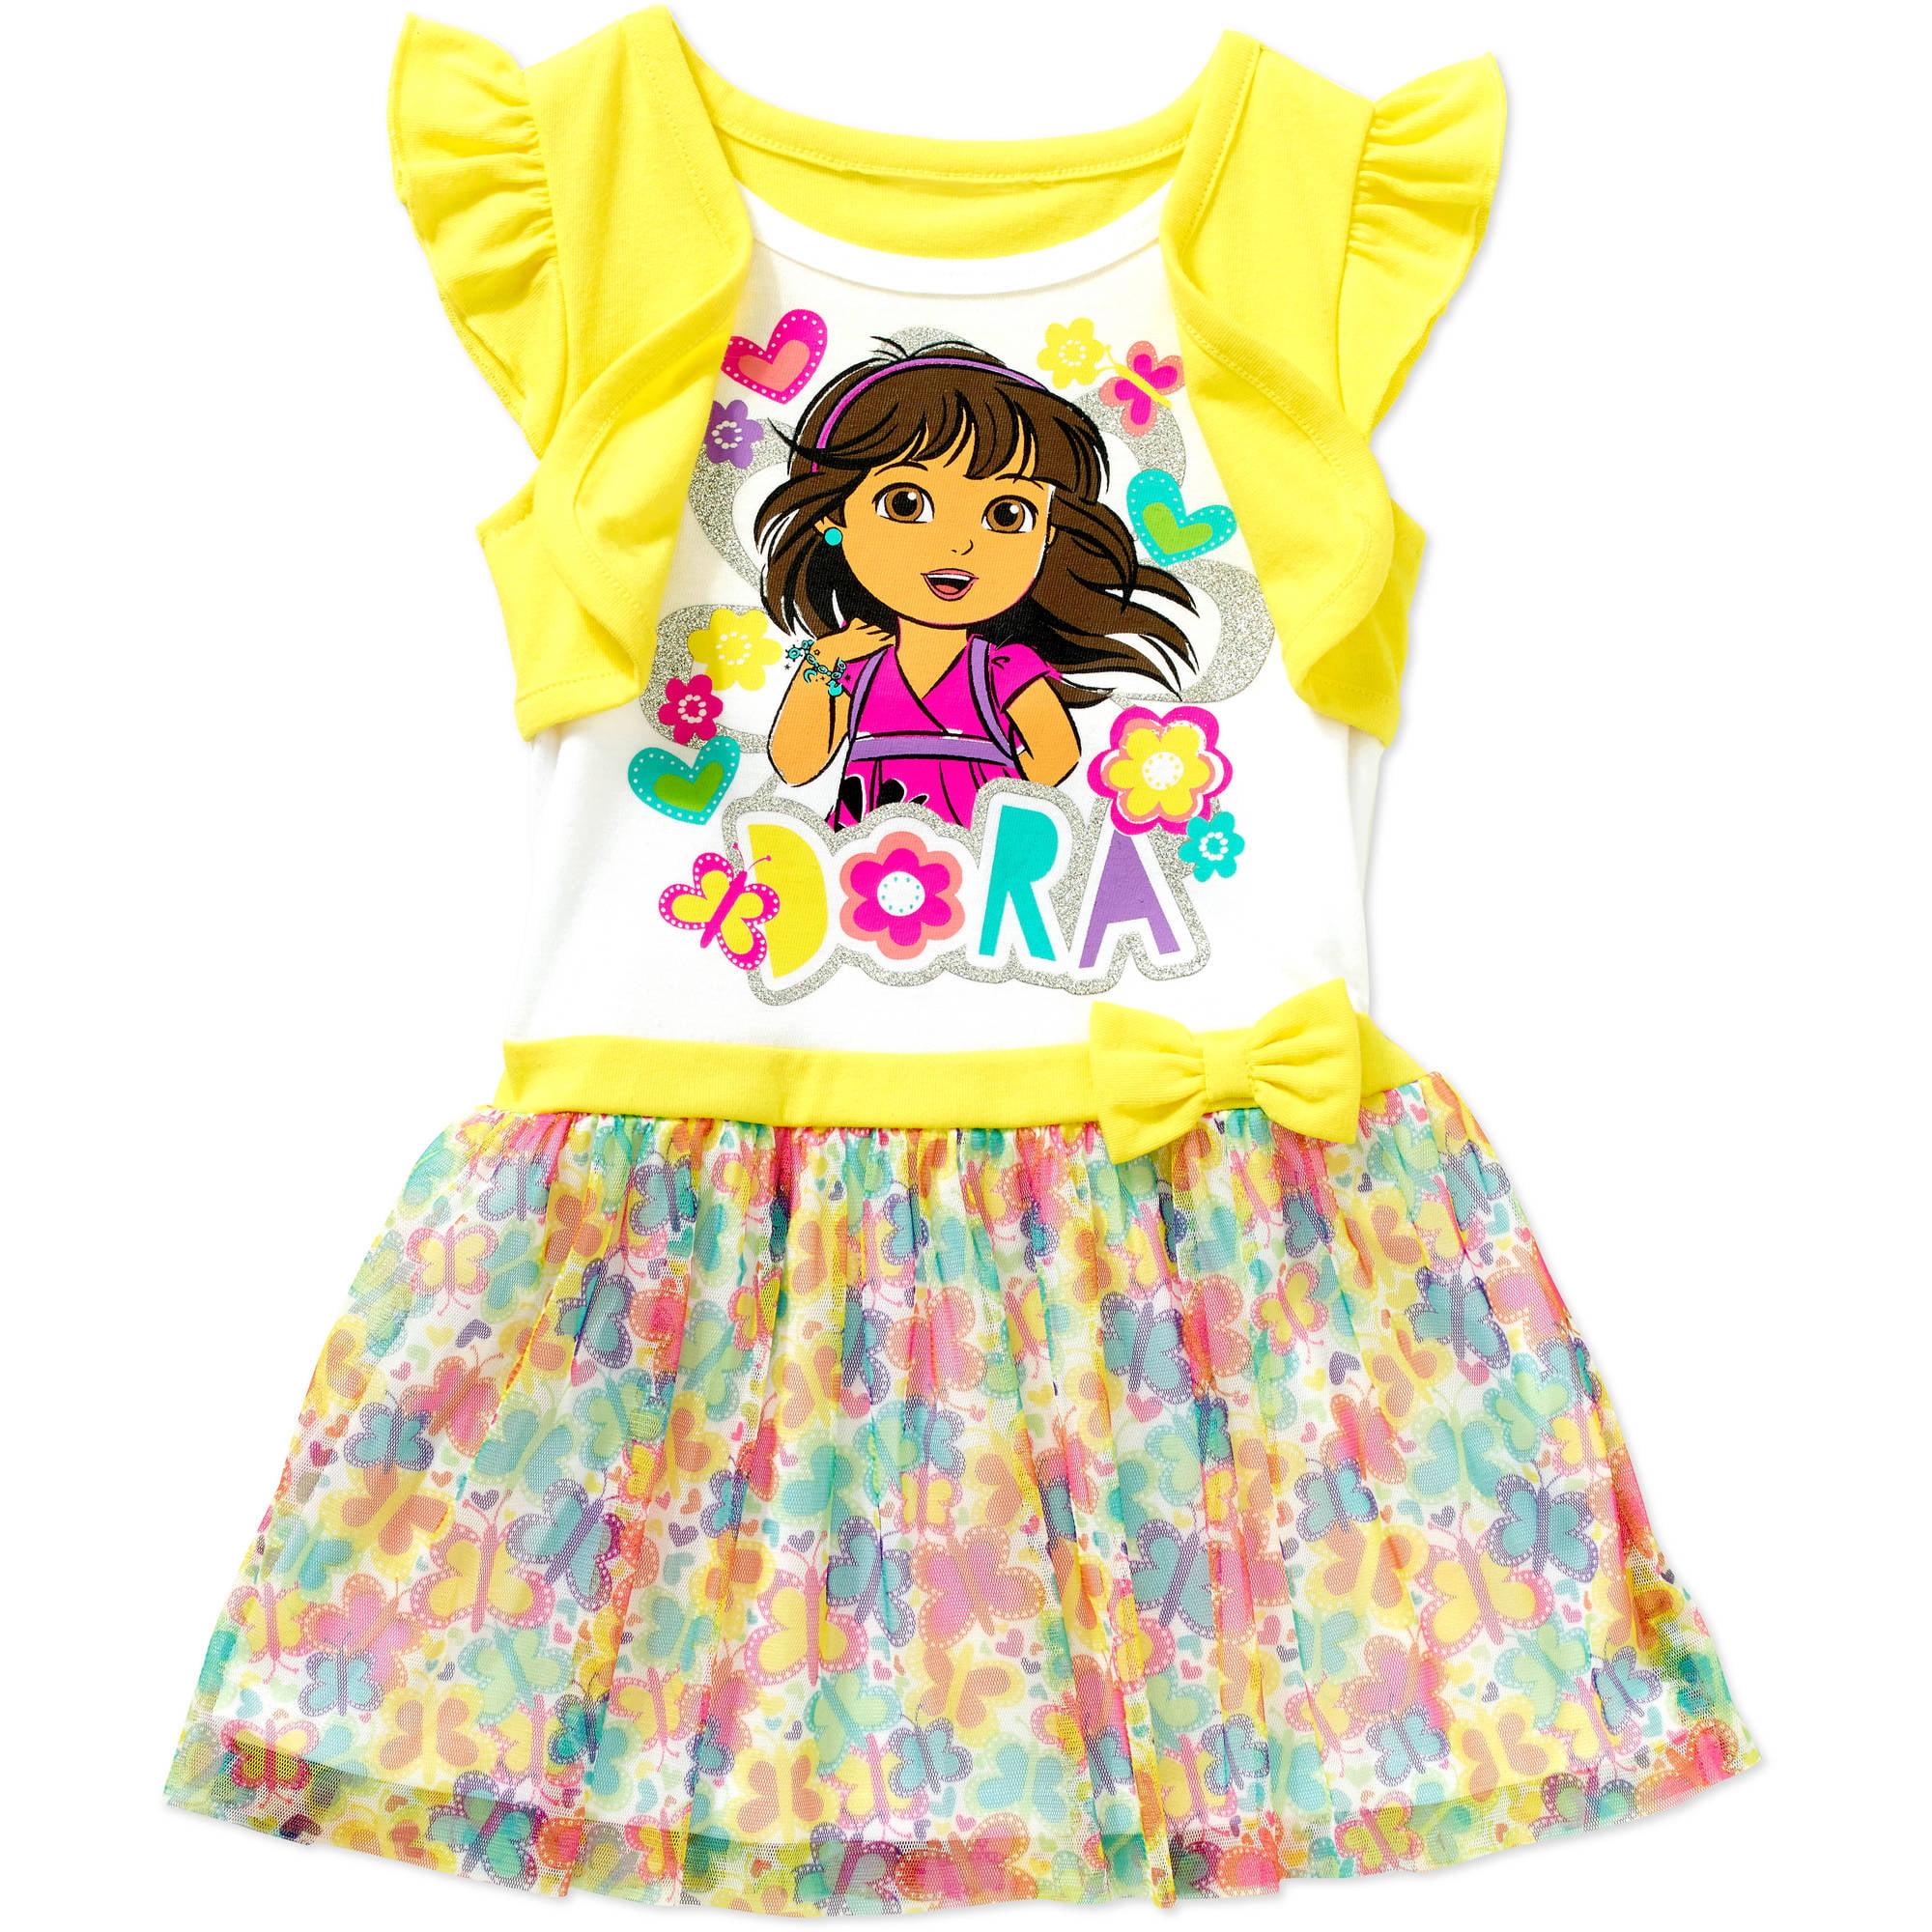 Nickelodeon Toddler Girl Tee Shirt Dress - Walmart.com